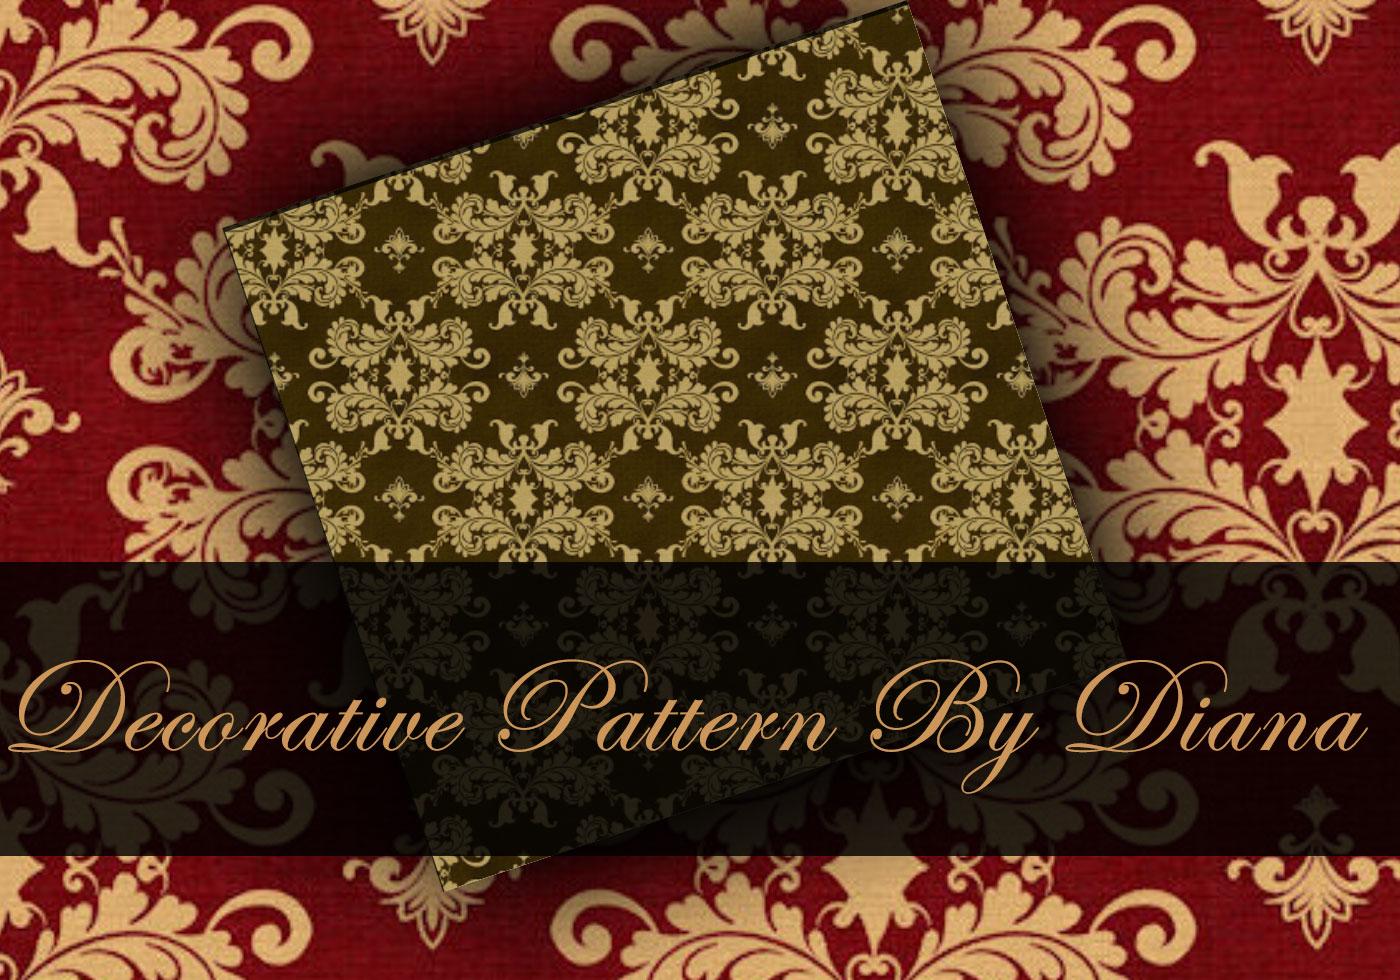 Decorative Patterns Custom Decoration